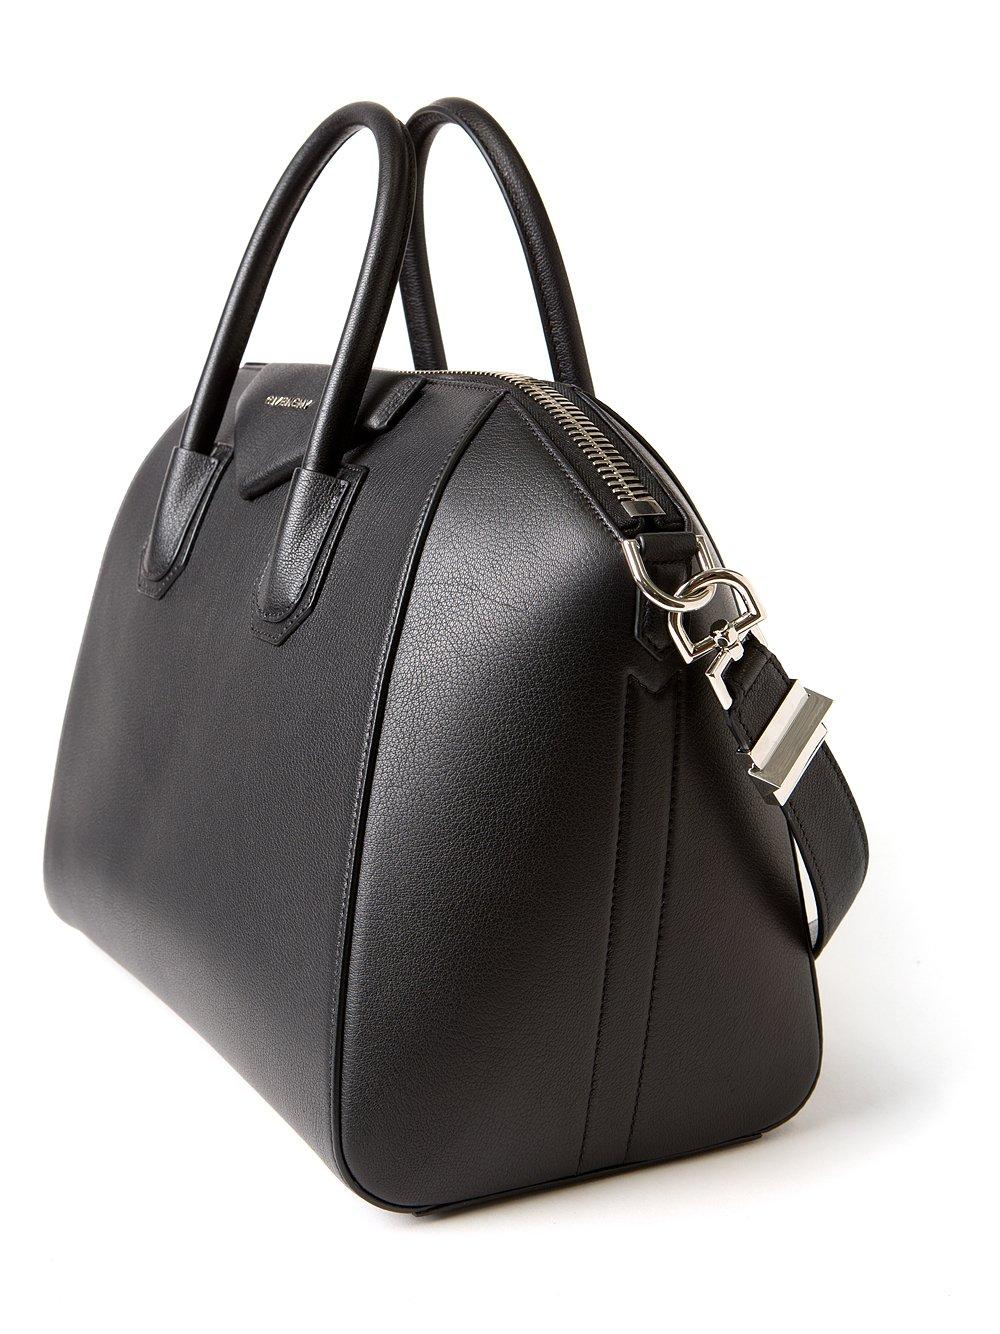 884820ed0124 Lyst - Givenchy Medium Antigona Bag in Black